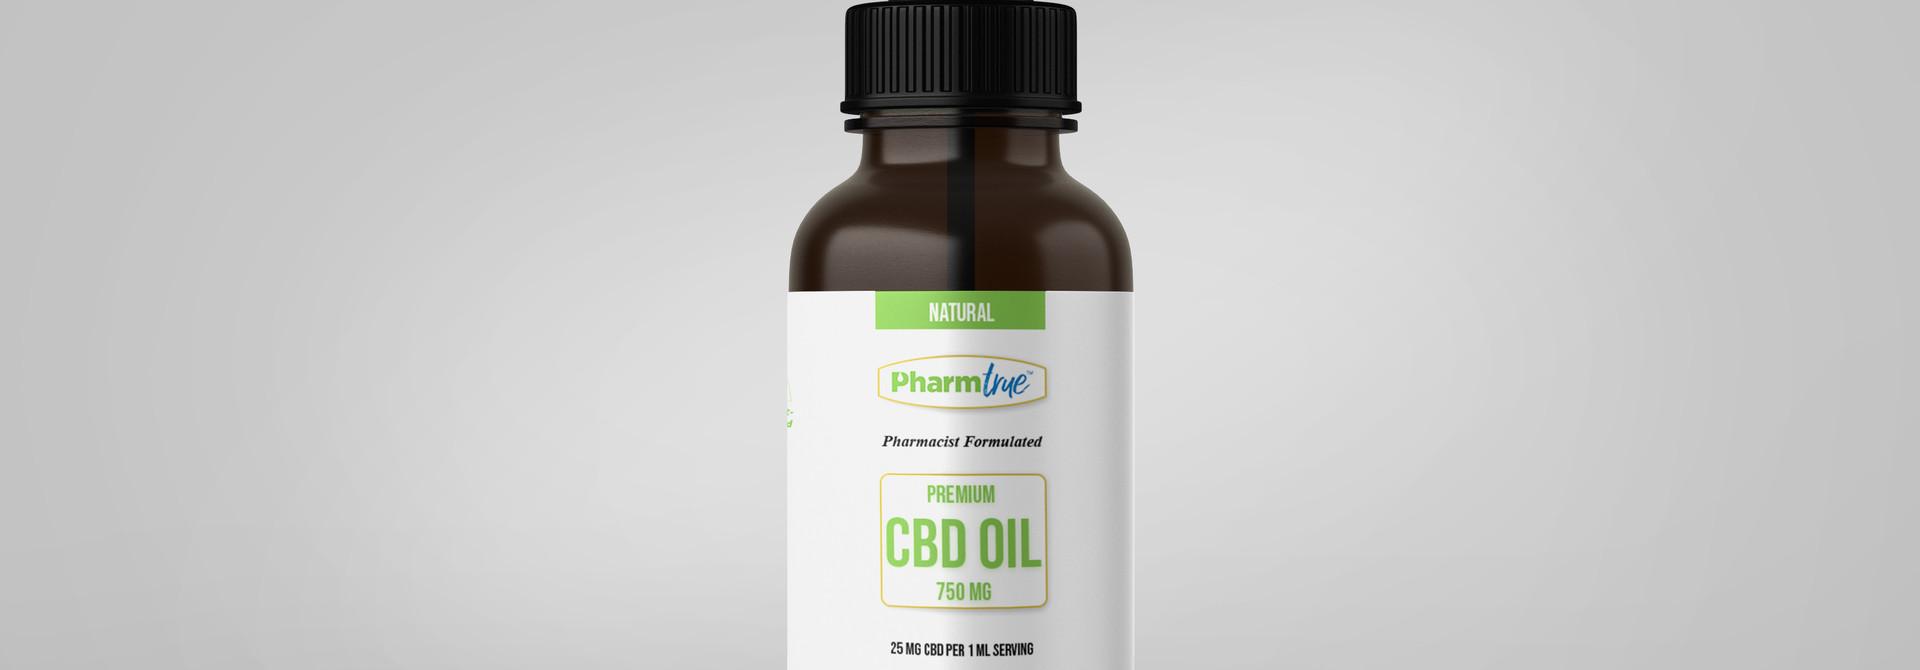 CBD OIL 750 mg TINCTURE - Natural